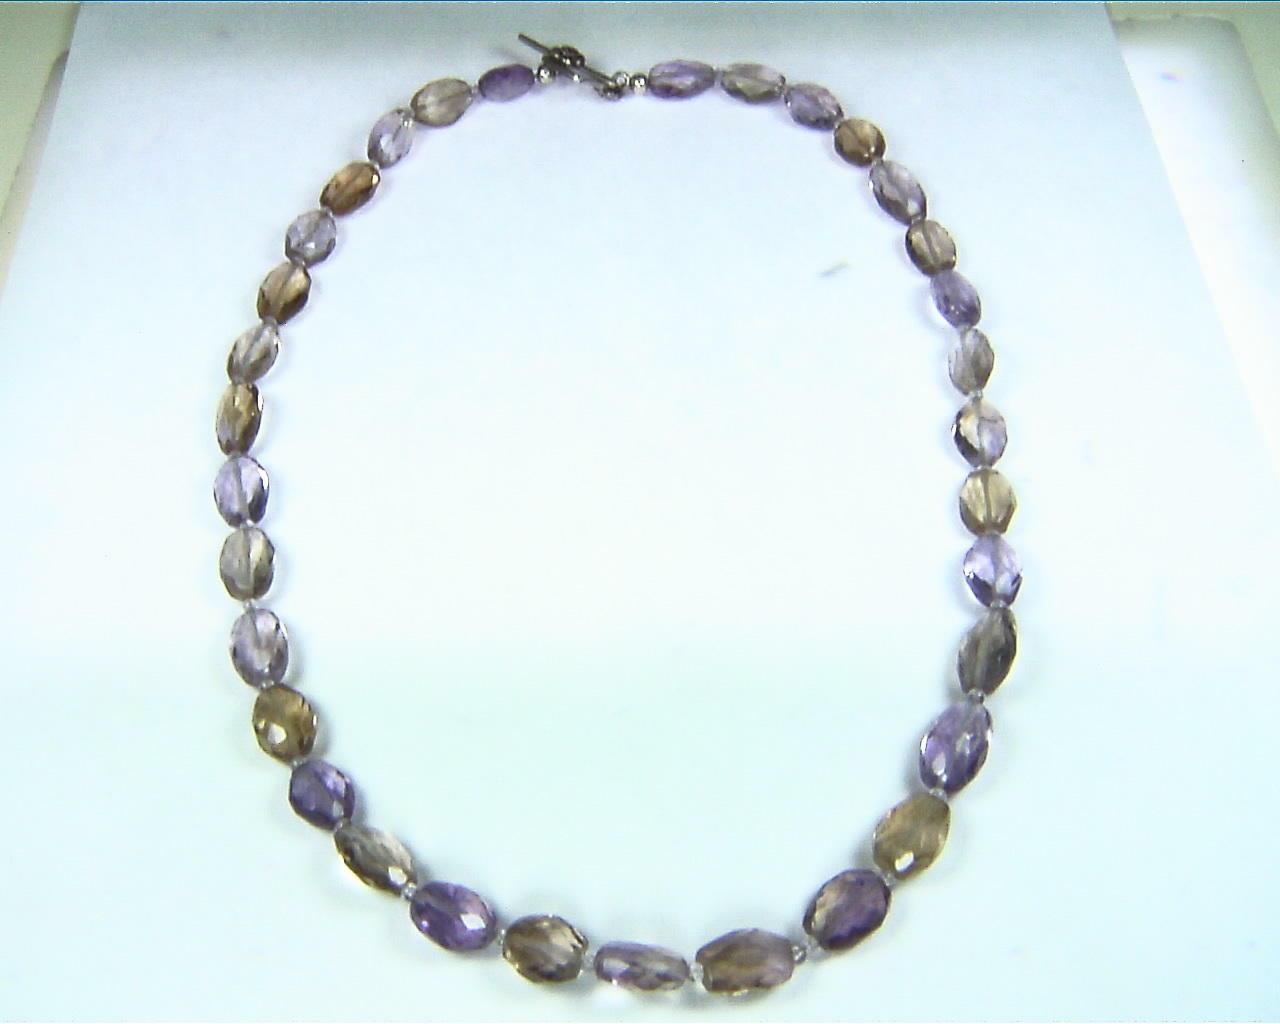 Ametrine Natural Genuine Gemstone Bead Necklace NBD,902